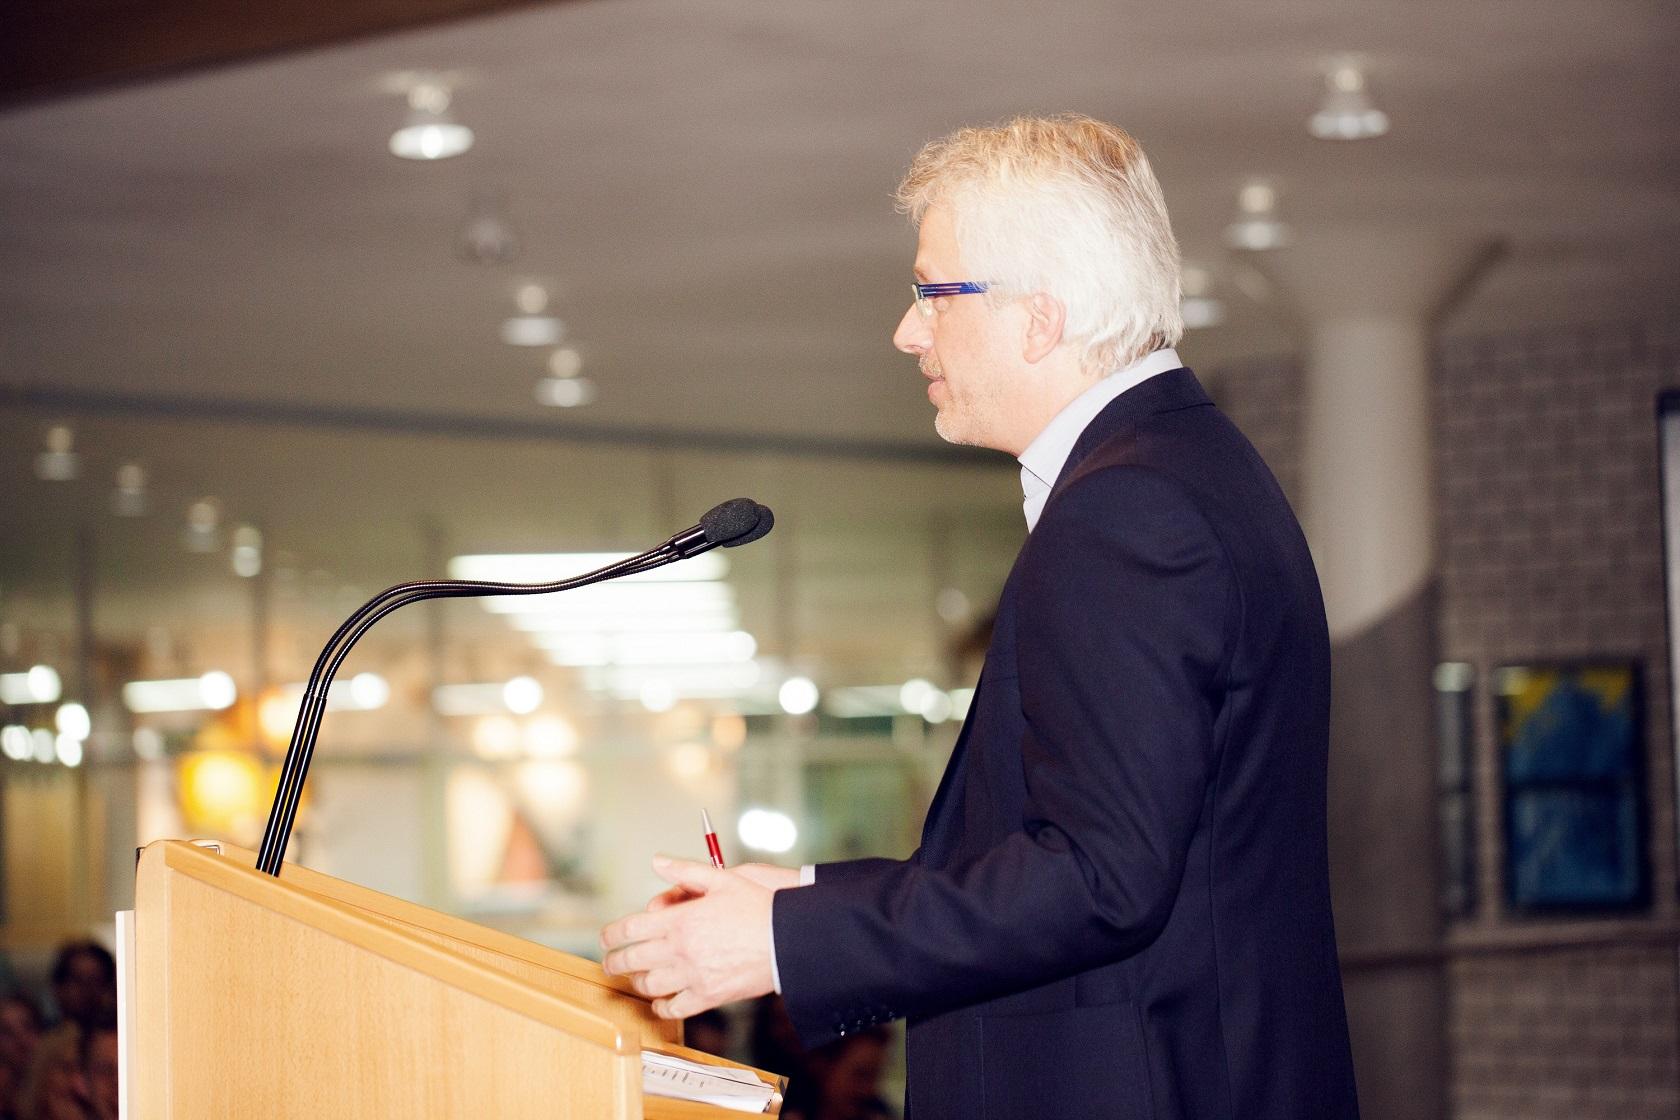 Schulabschlussfeier Bruchsal 2016 Rede Matthias Müller